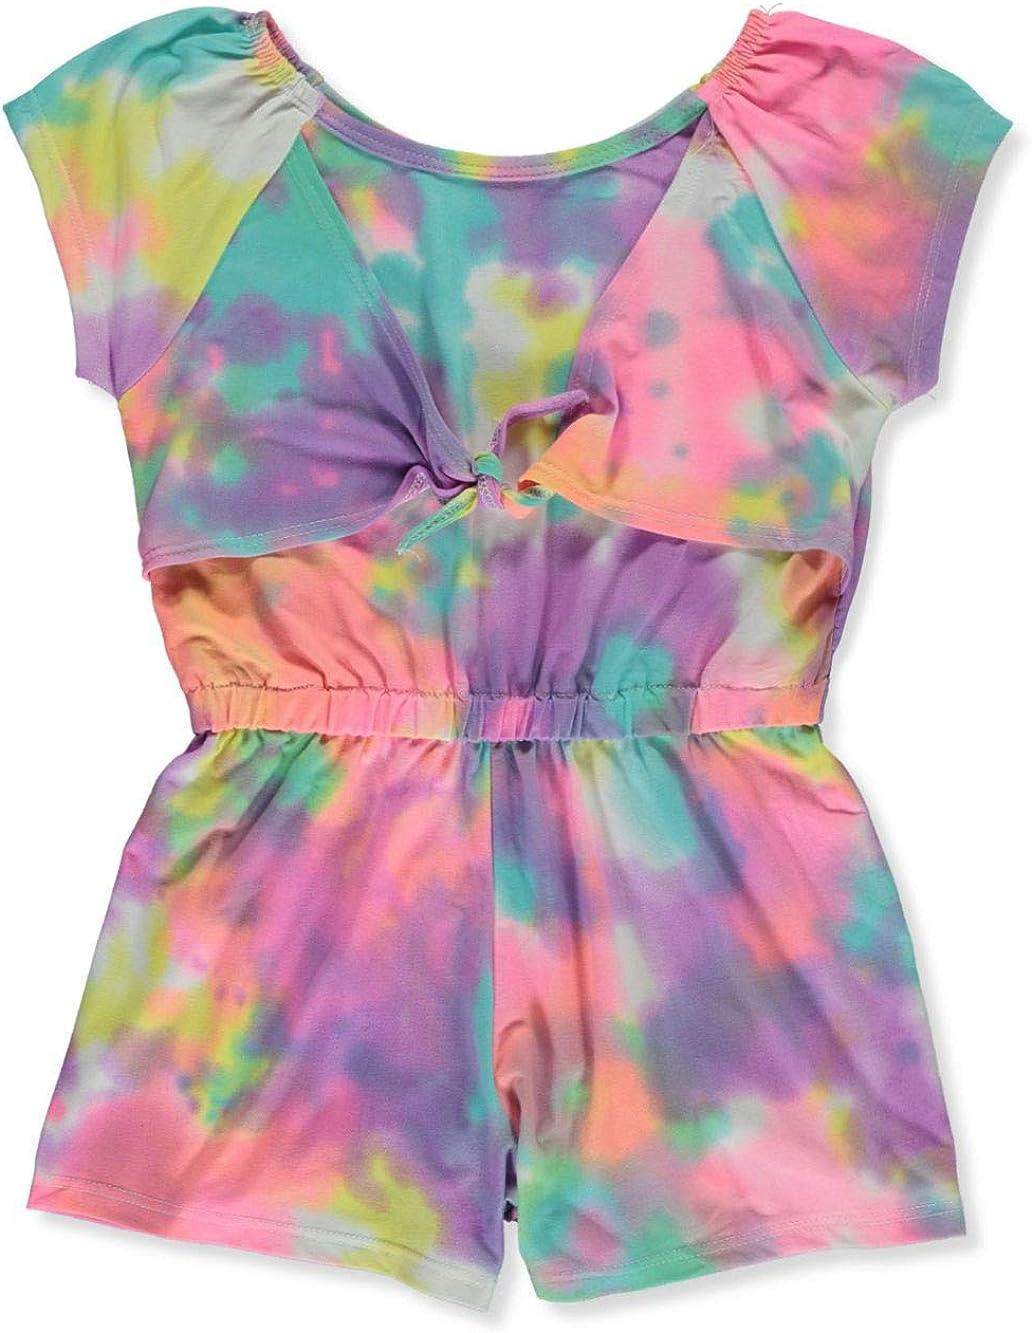 One Step Up Girls Tie-Dye Romper